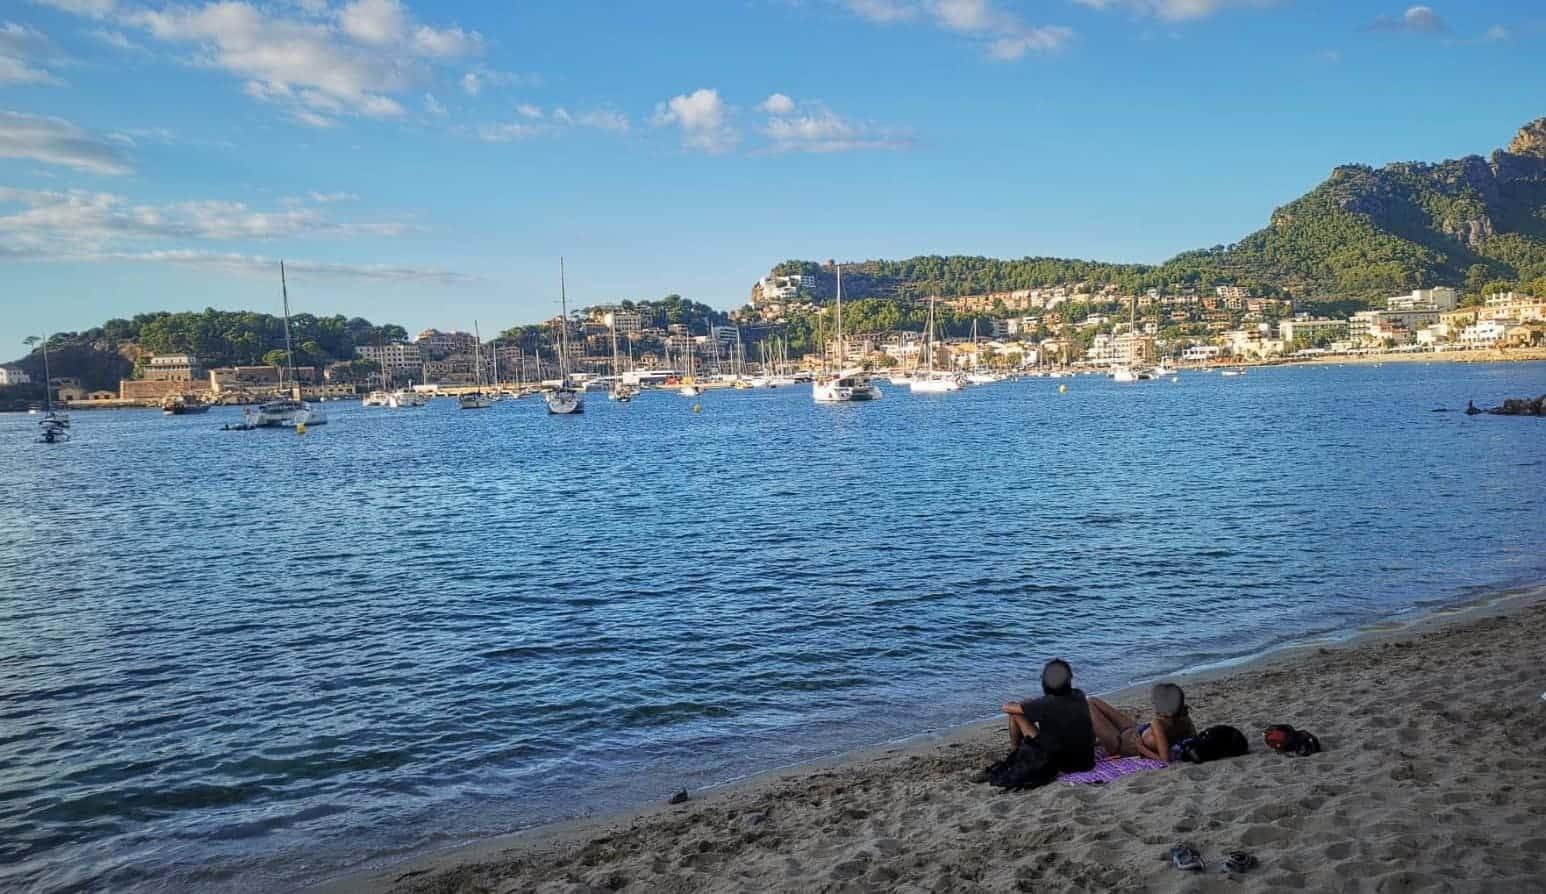 Port de Sóller - Strand -Platja den Repic